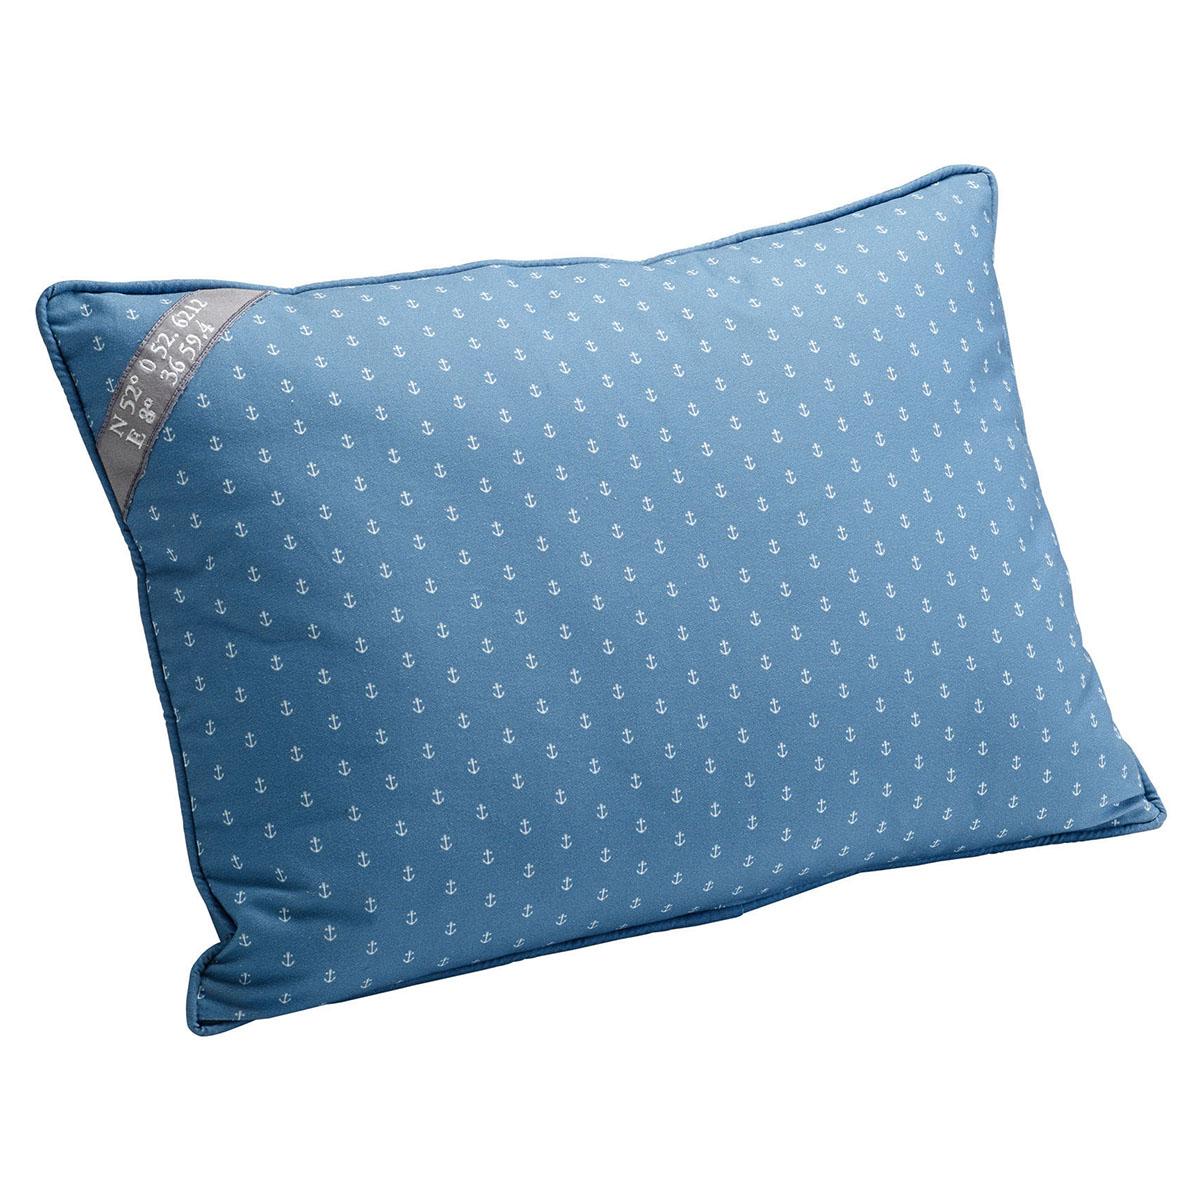 hunter deko kissen niblum blau wei. Black Bedroom Furniture Sets. Home Design Ideas